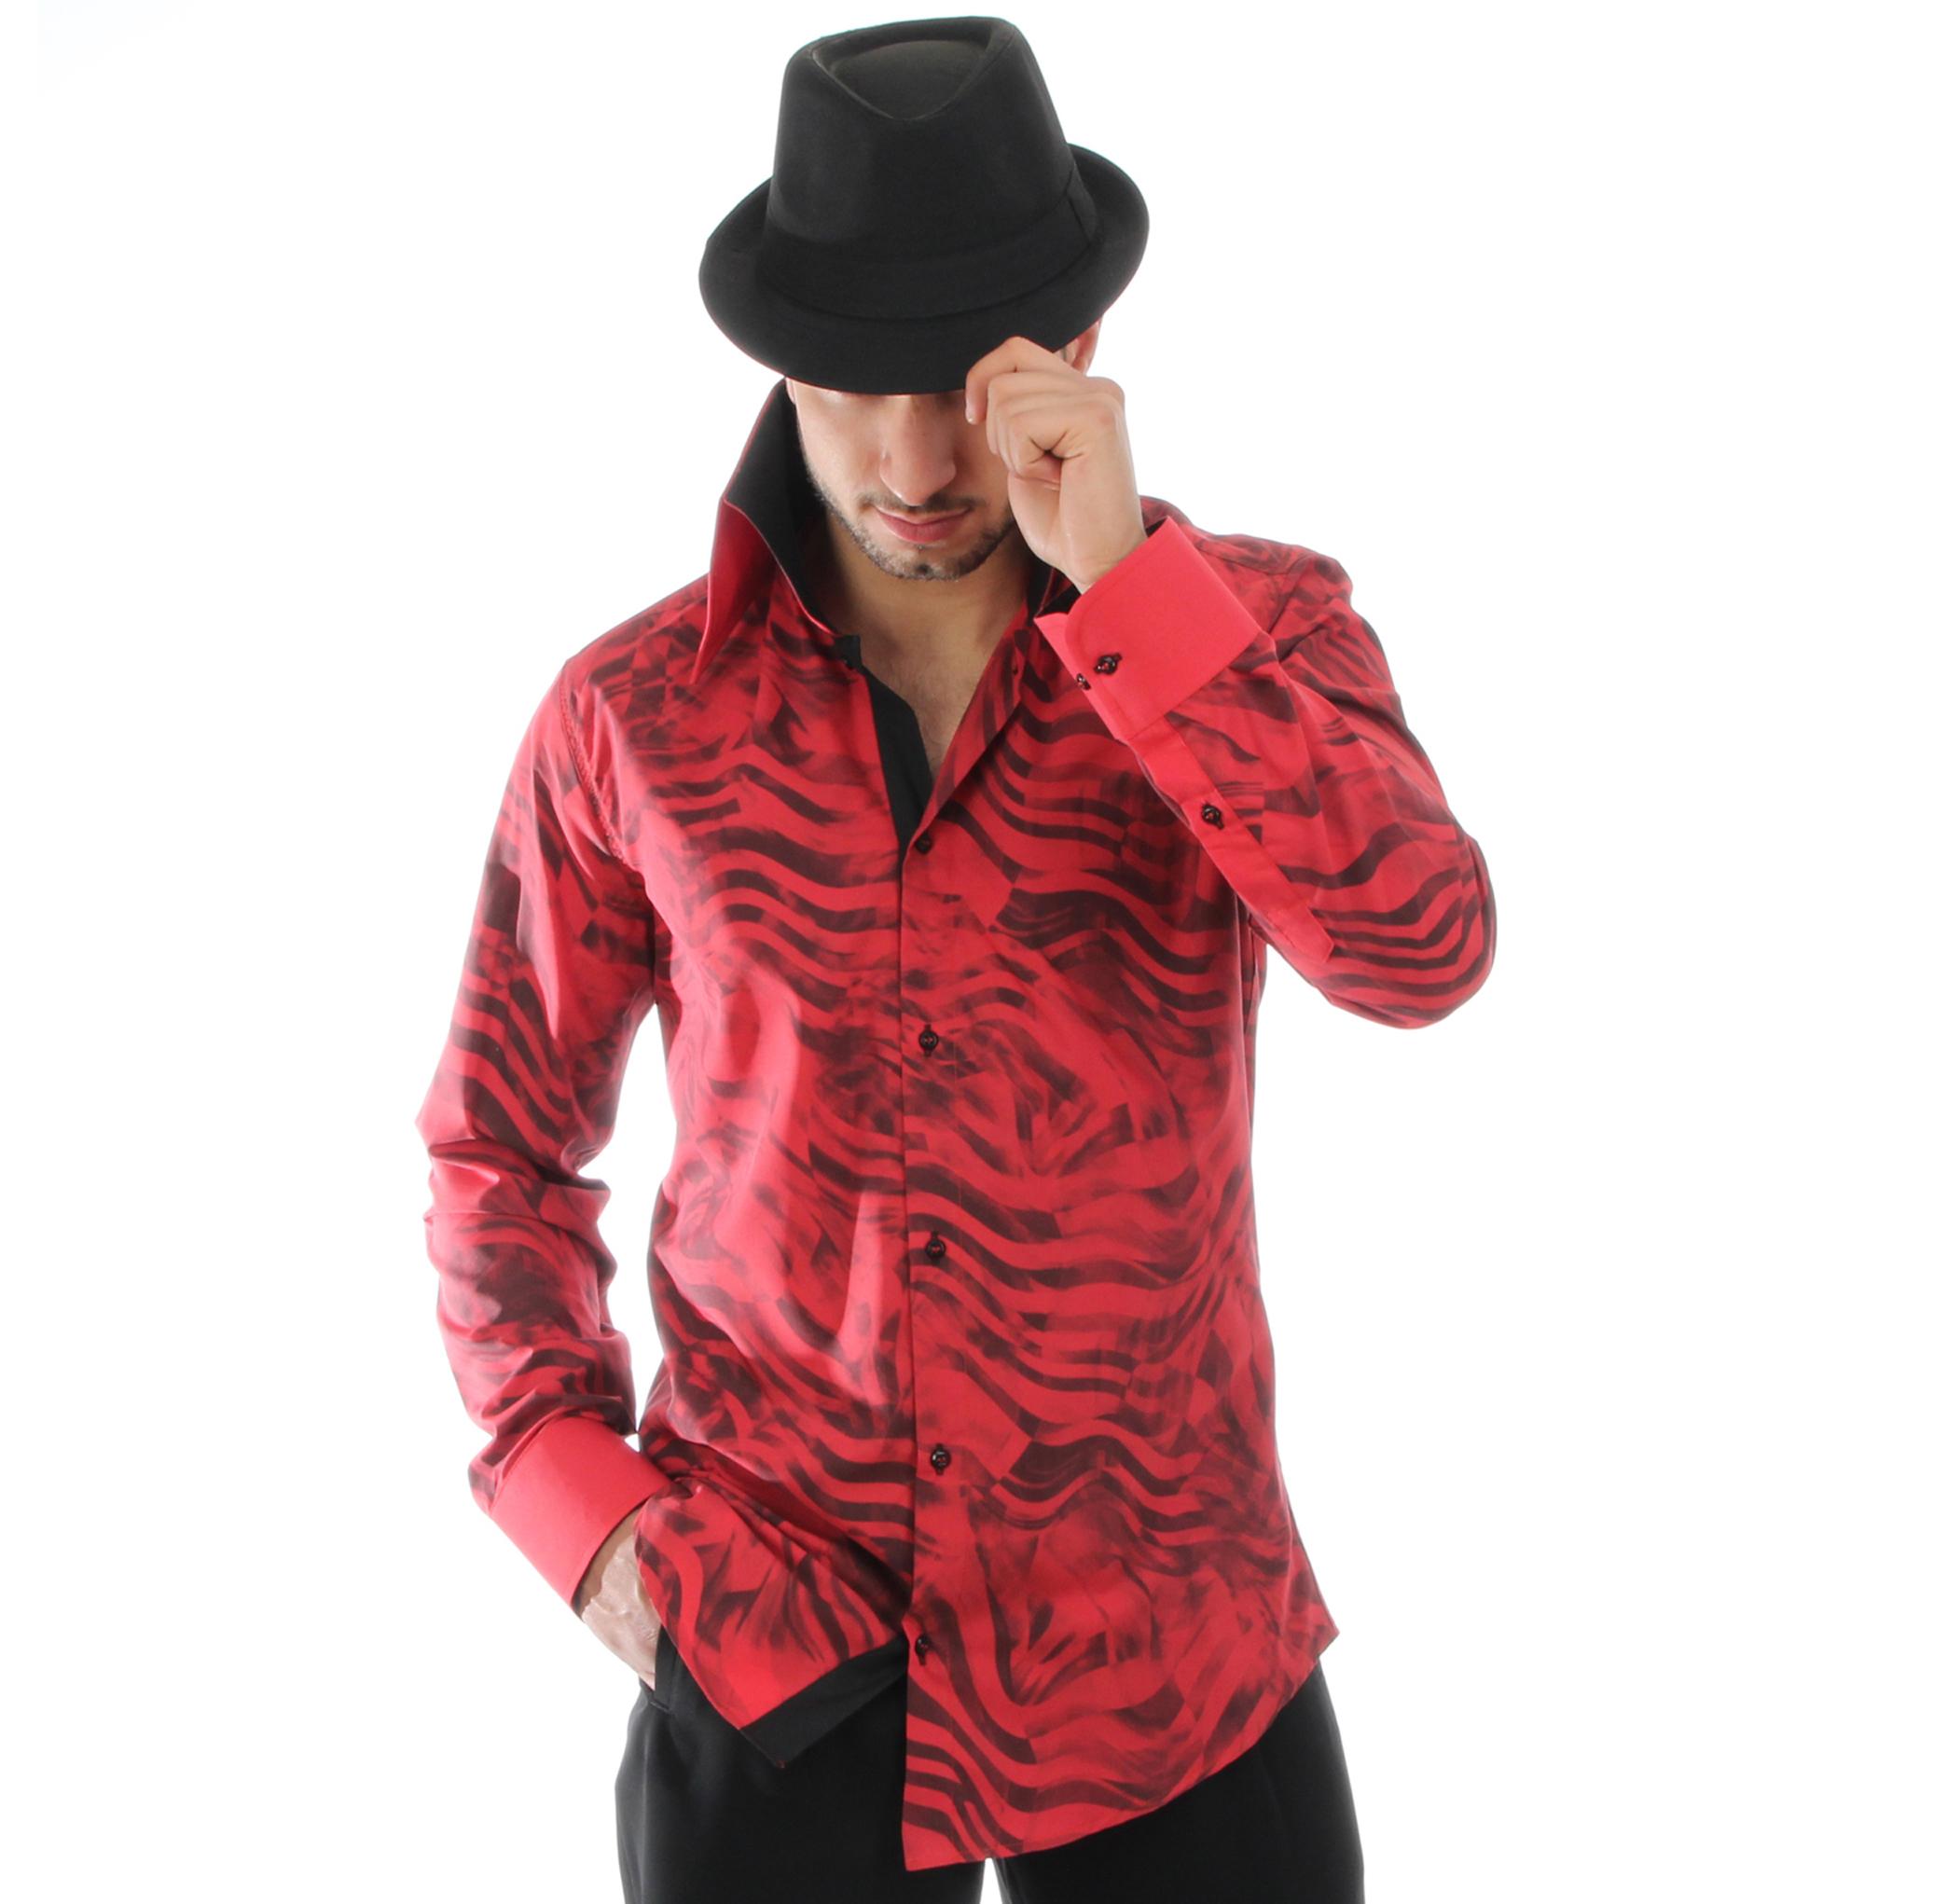 H.K. Mandel Kreative Mode für Männer - Rock n Roll-Ära Elvis Presley ... 95533a64b2